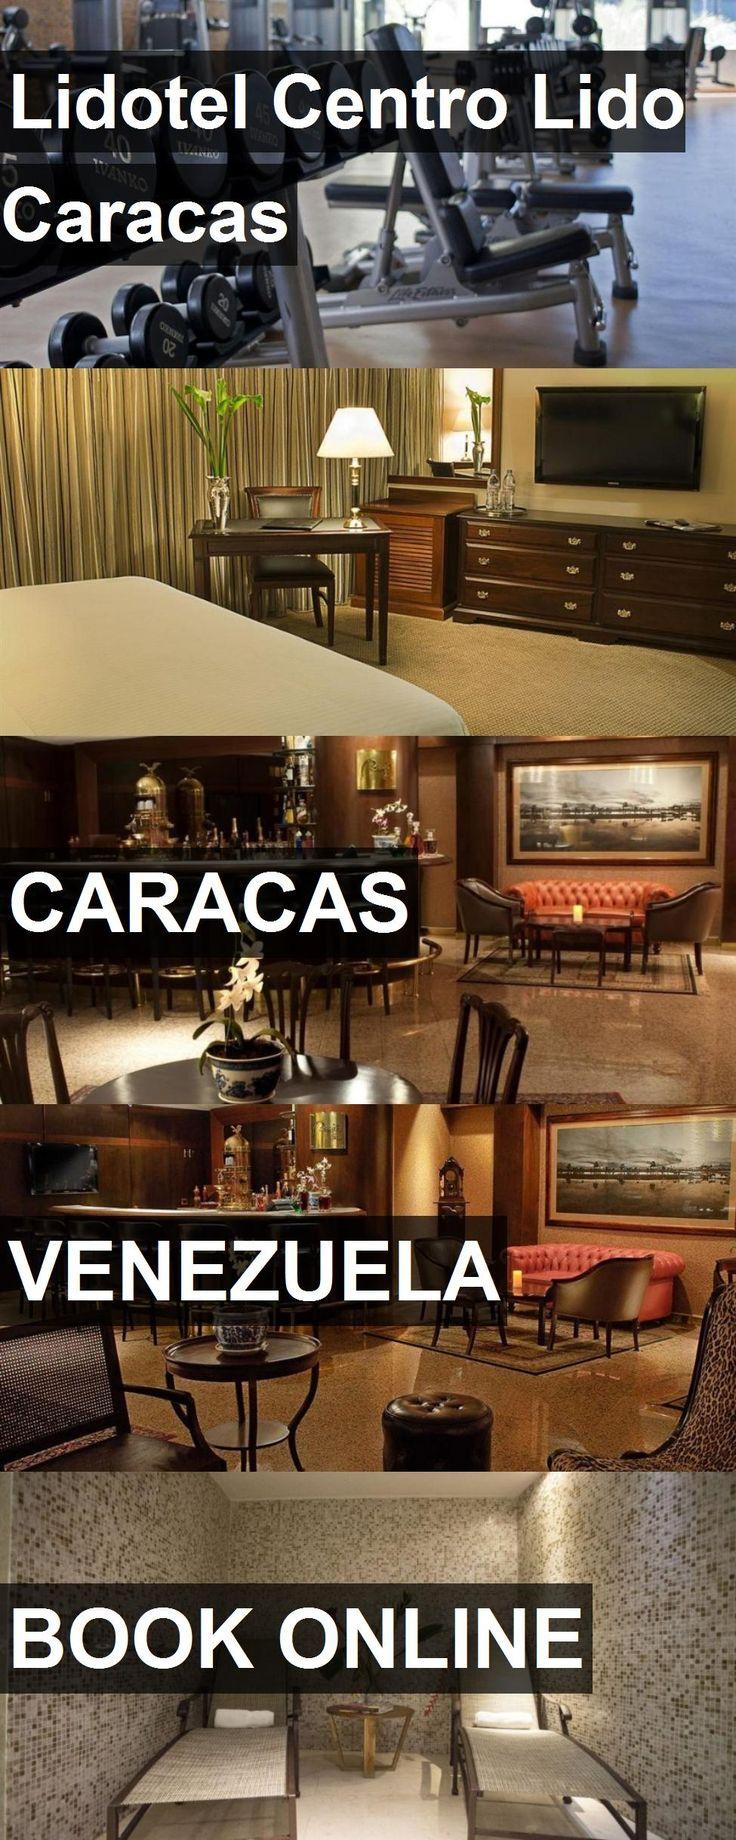 Hotel Lidotel Centro Lido Caracas in Caracas, Venezuela. For more information, photos, reviews and best prices please follow the link. #Venezuela #Caracas #travel #vacation #hotel